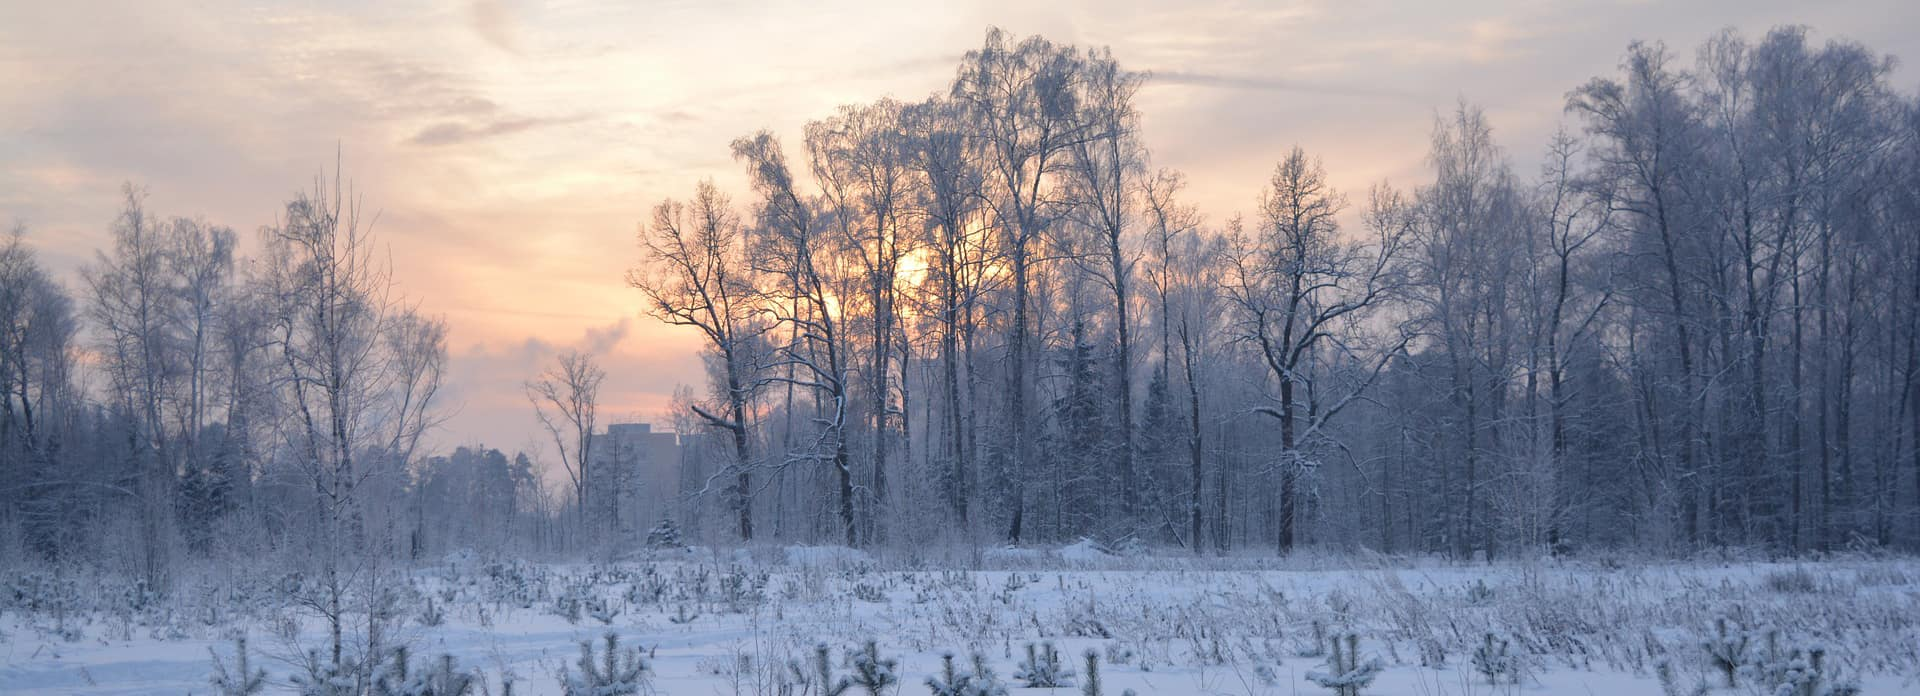 plus beaux endroits russie